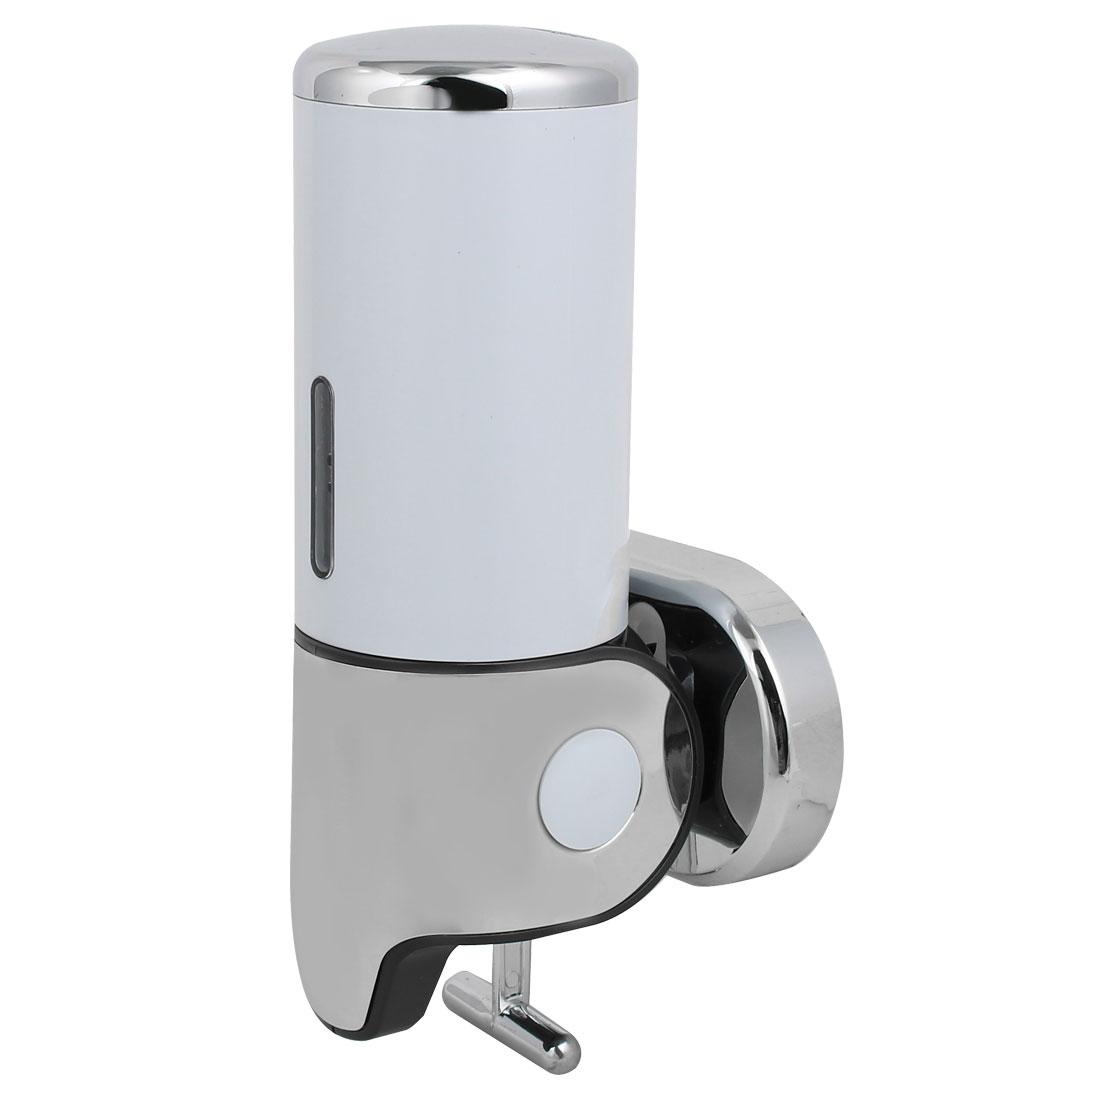 17 oz Capacity ABS Plastic Wall Mount Single Chember Soap Dispenser White